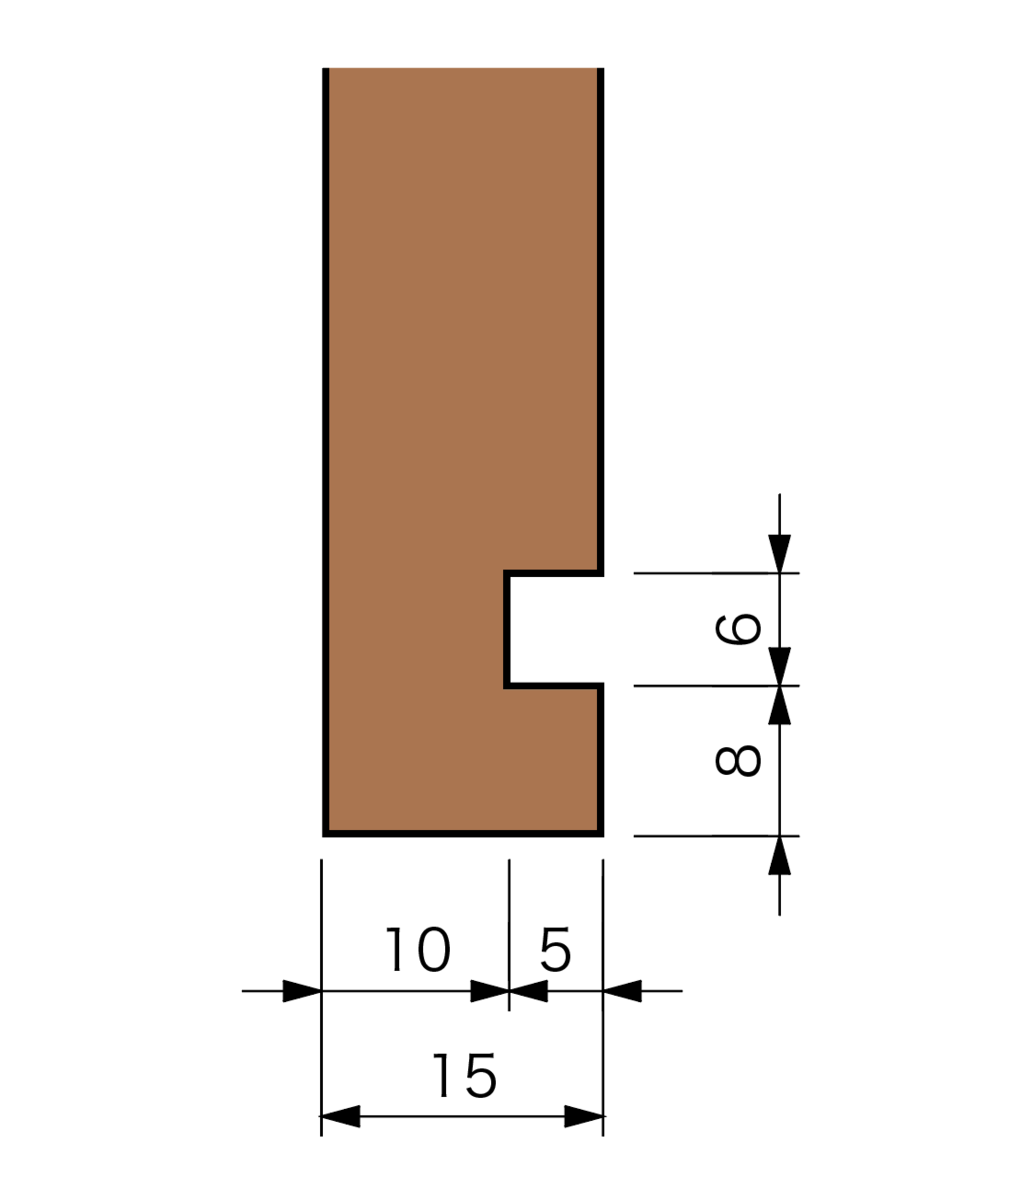 f:id:kimparatoru:20210607172325p:plain